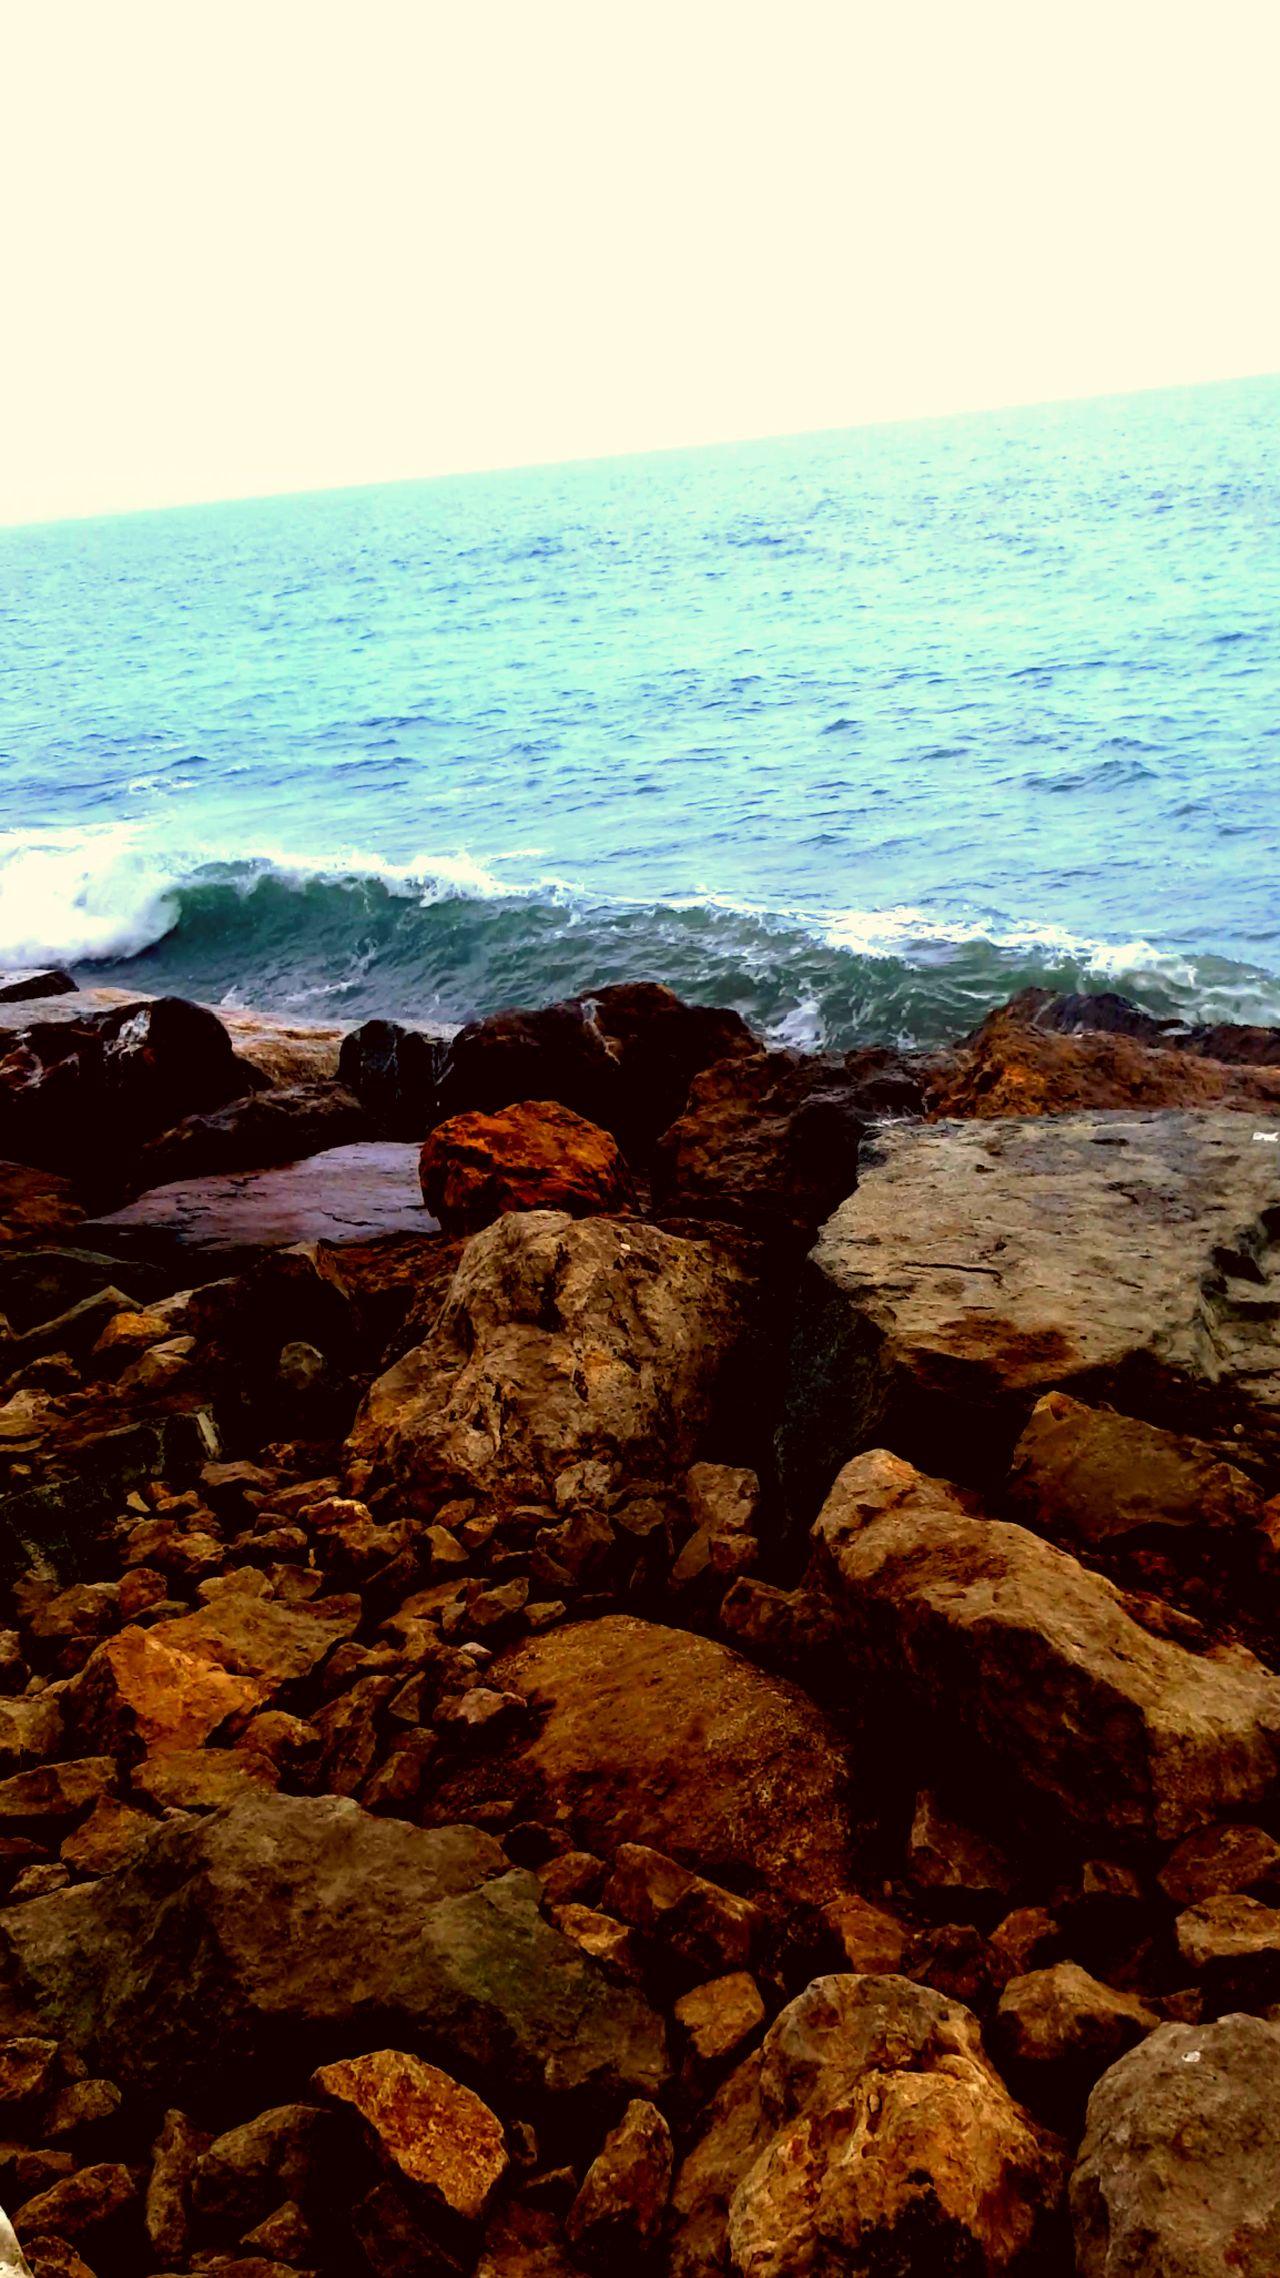 California Santa Monica Santa Monica Beach Ocean Wawes Rocks Blu Oceans Relaxing Chill Chill Mode